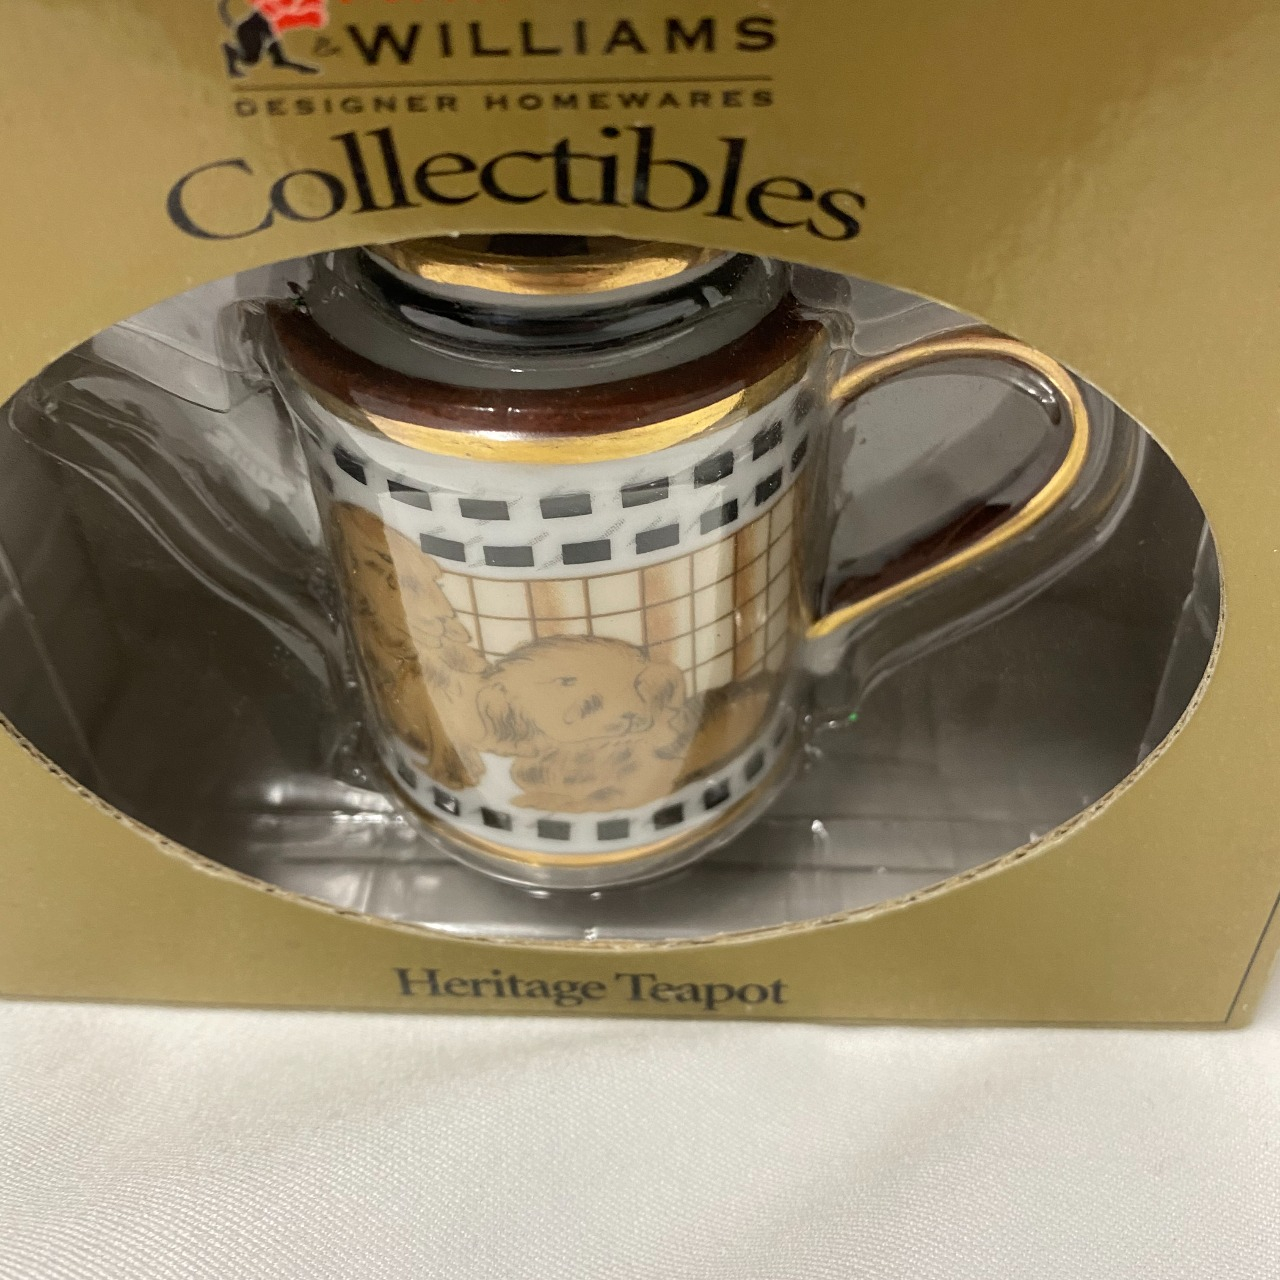 Maxwell & WIlliams Designer Homewares Collectibles